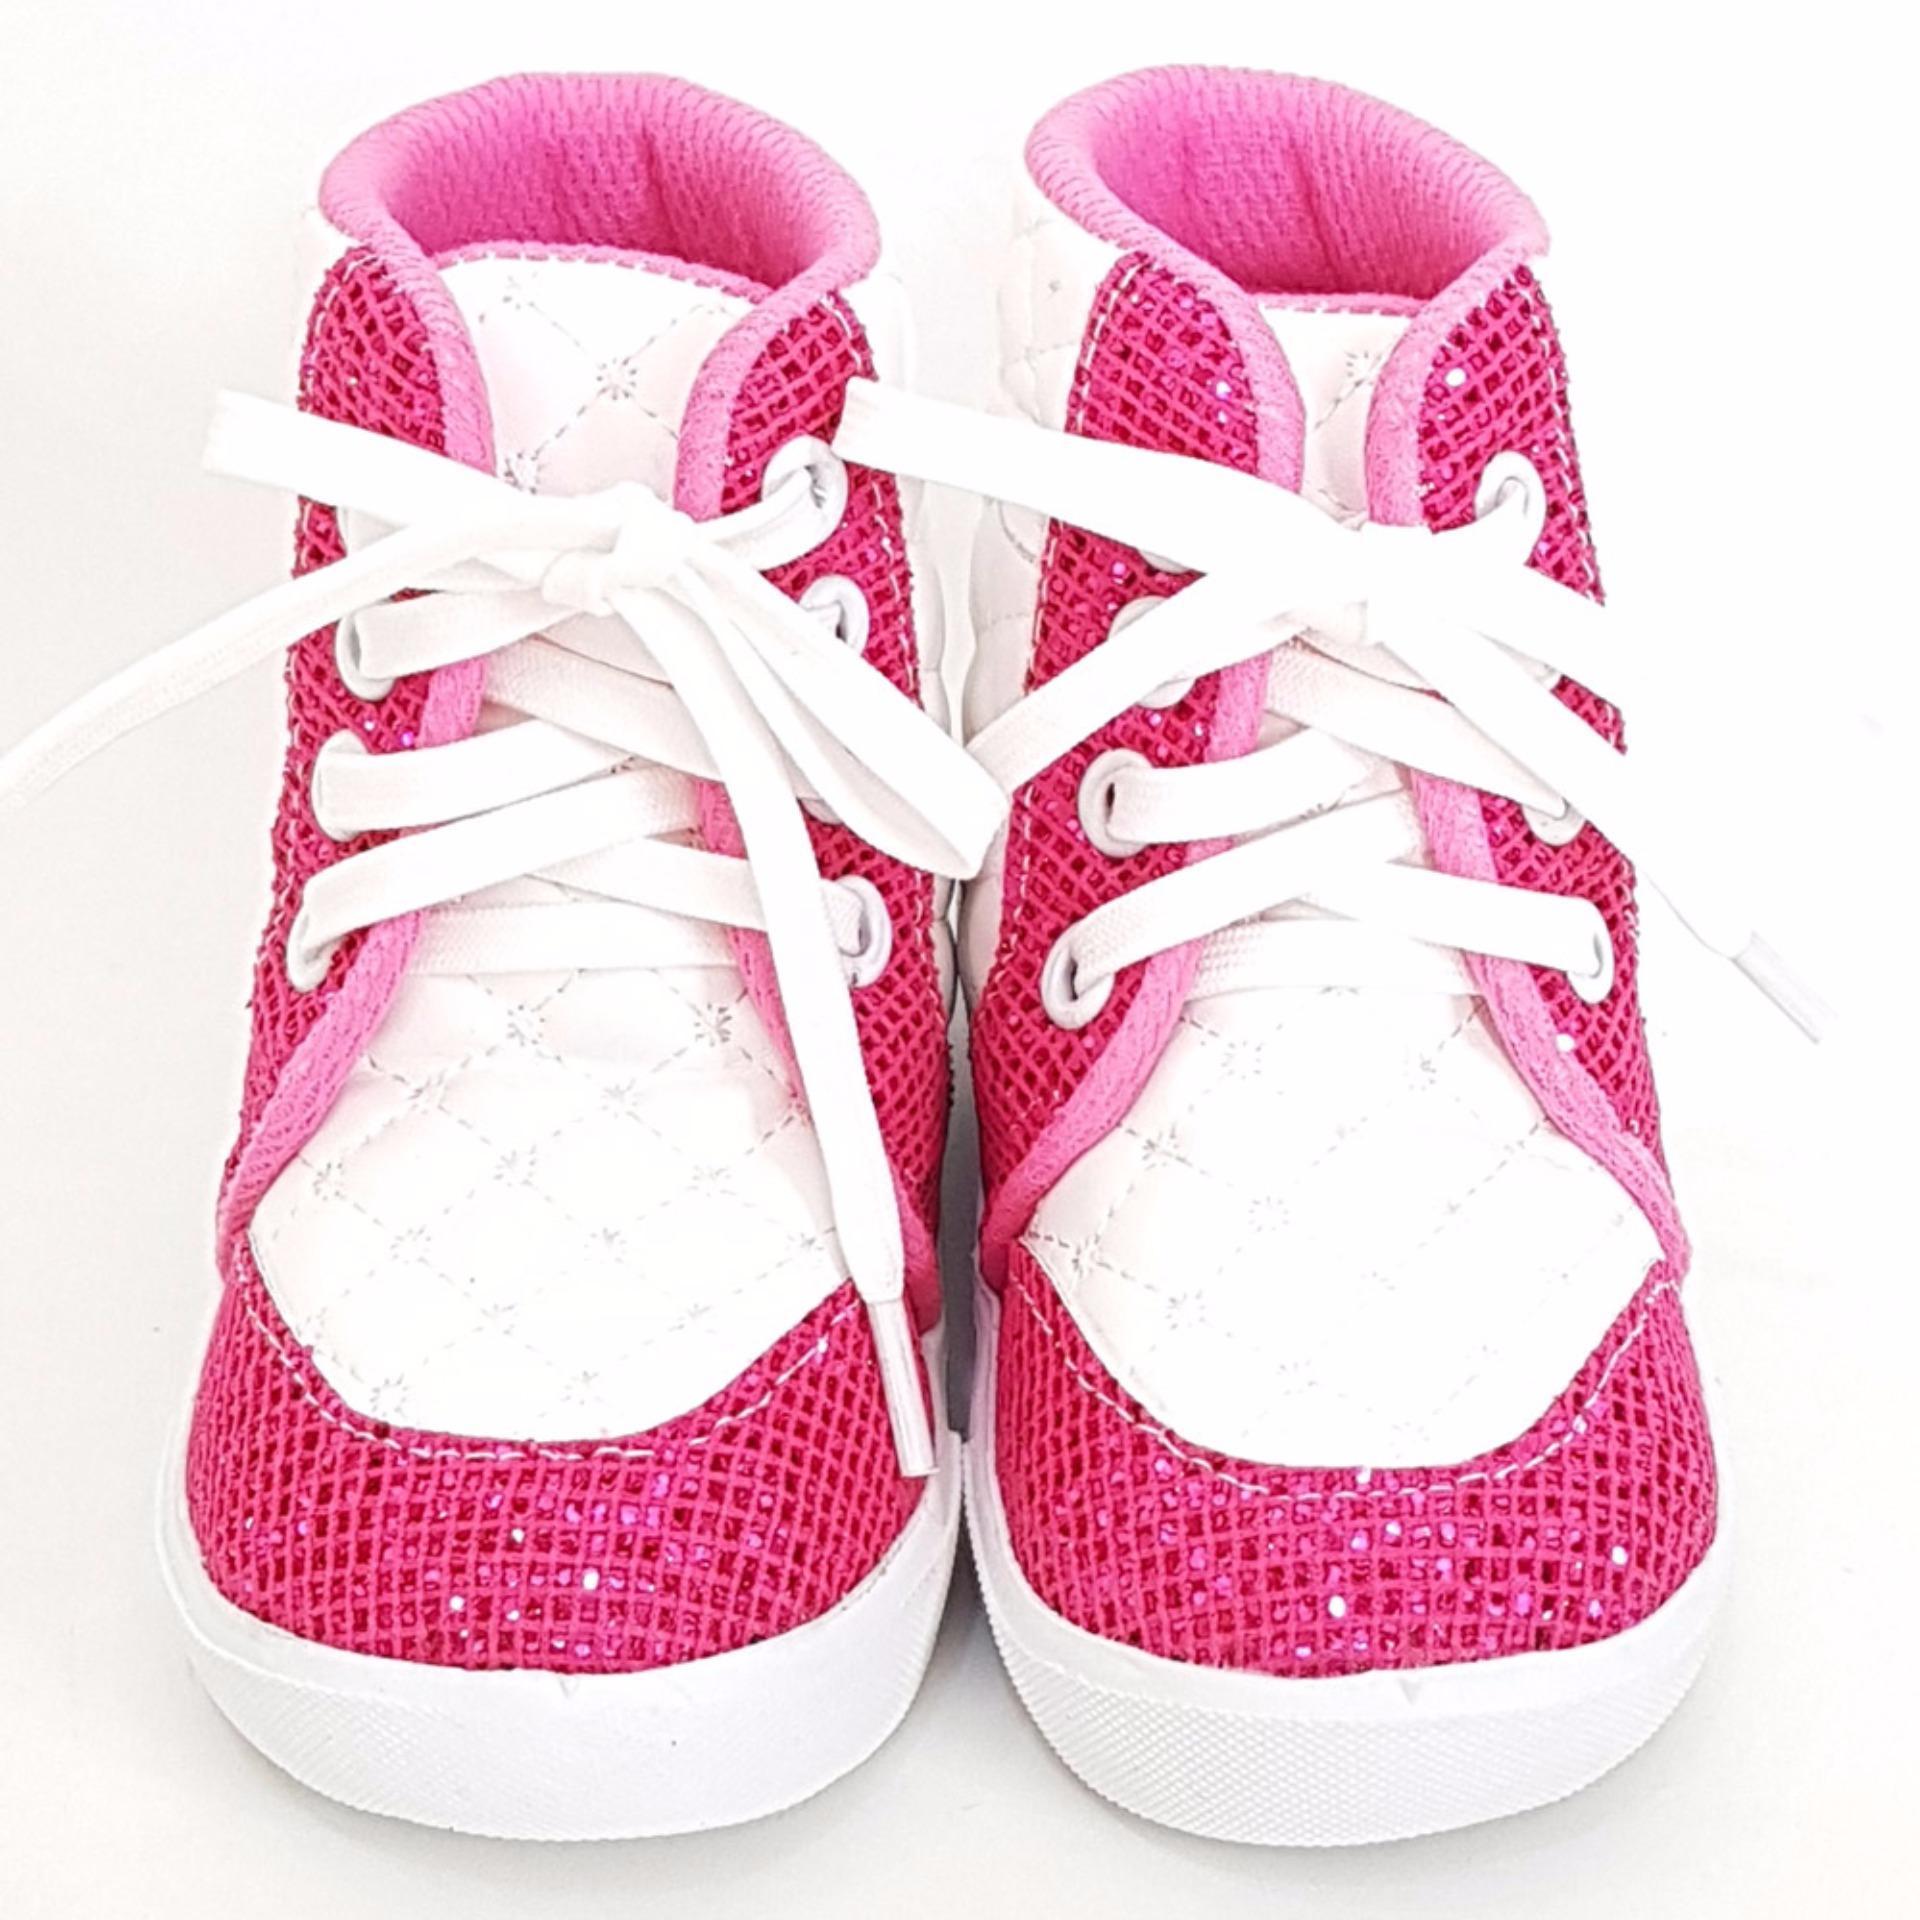 Harga Termurah Trendishoes Sepatu Boot Anak Perempuan Tali Kece Tlce Putihfuchsia